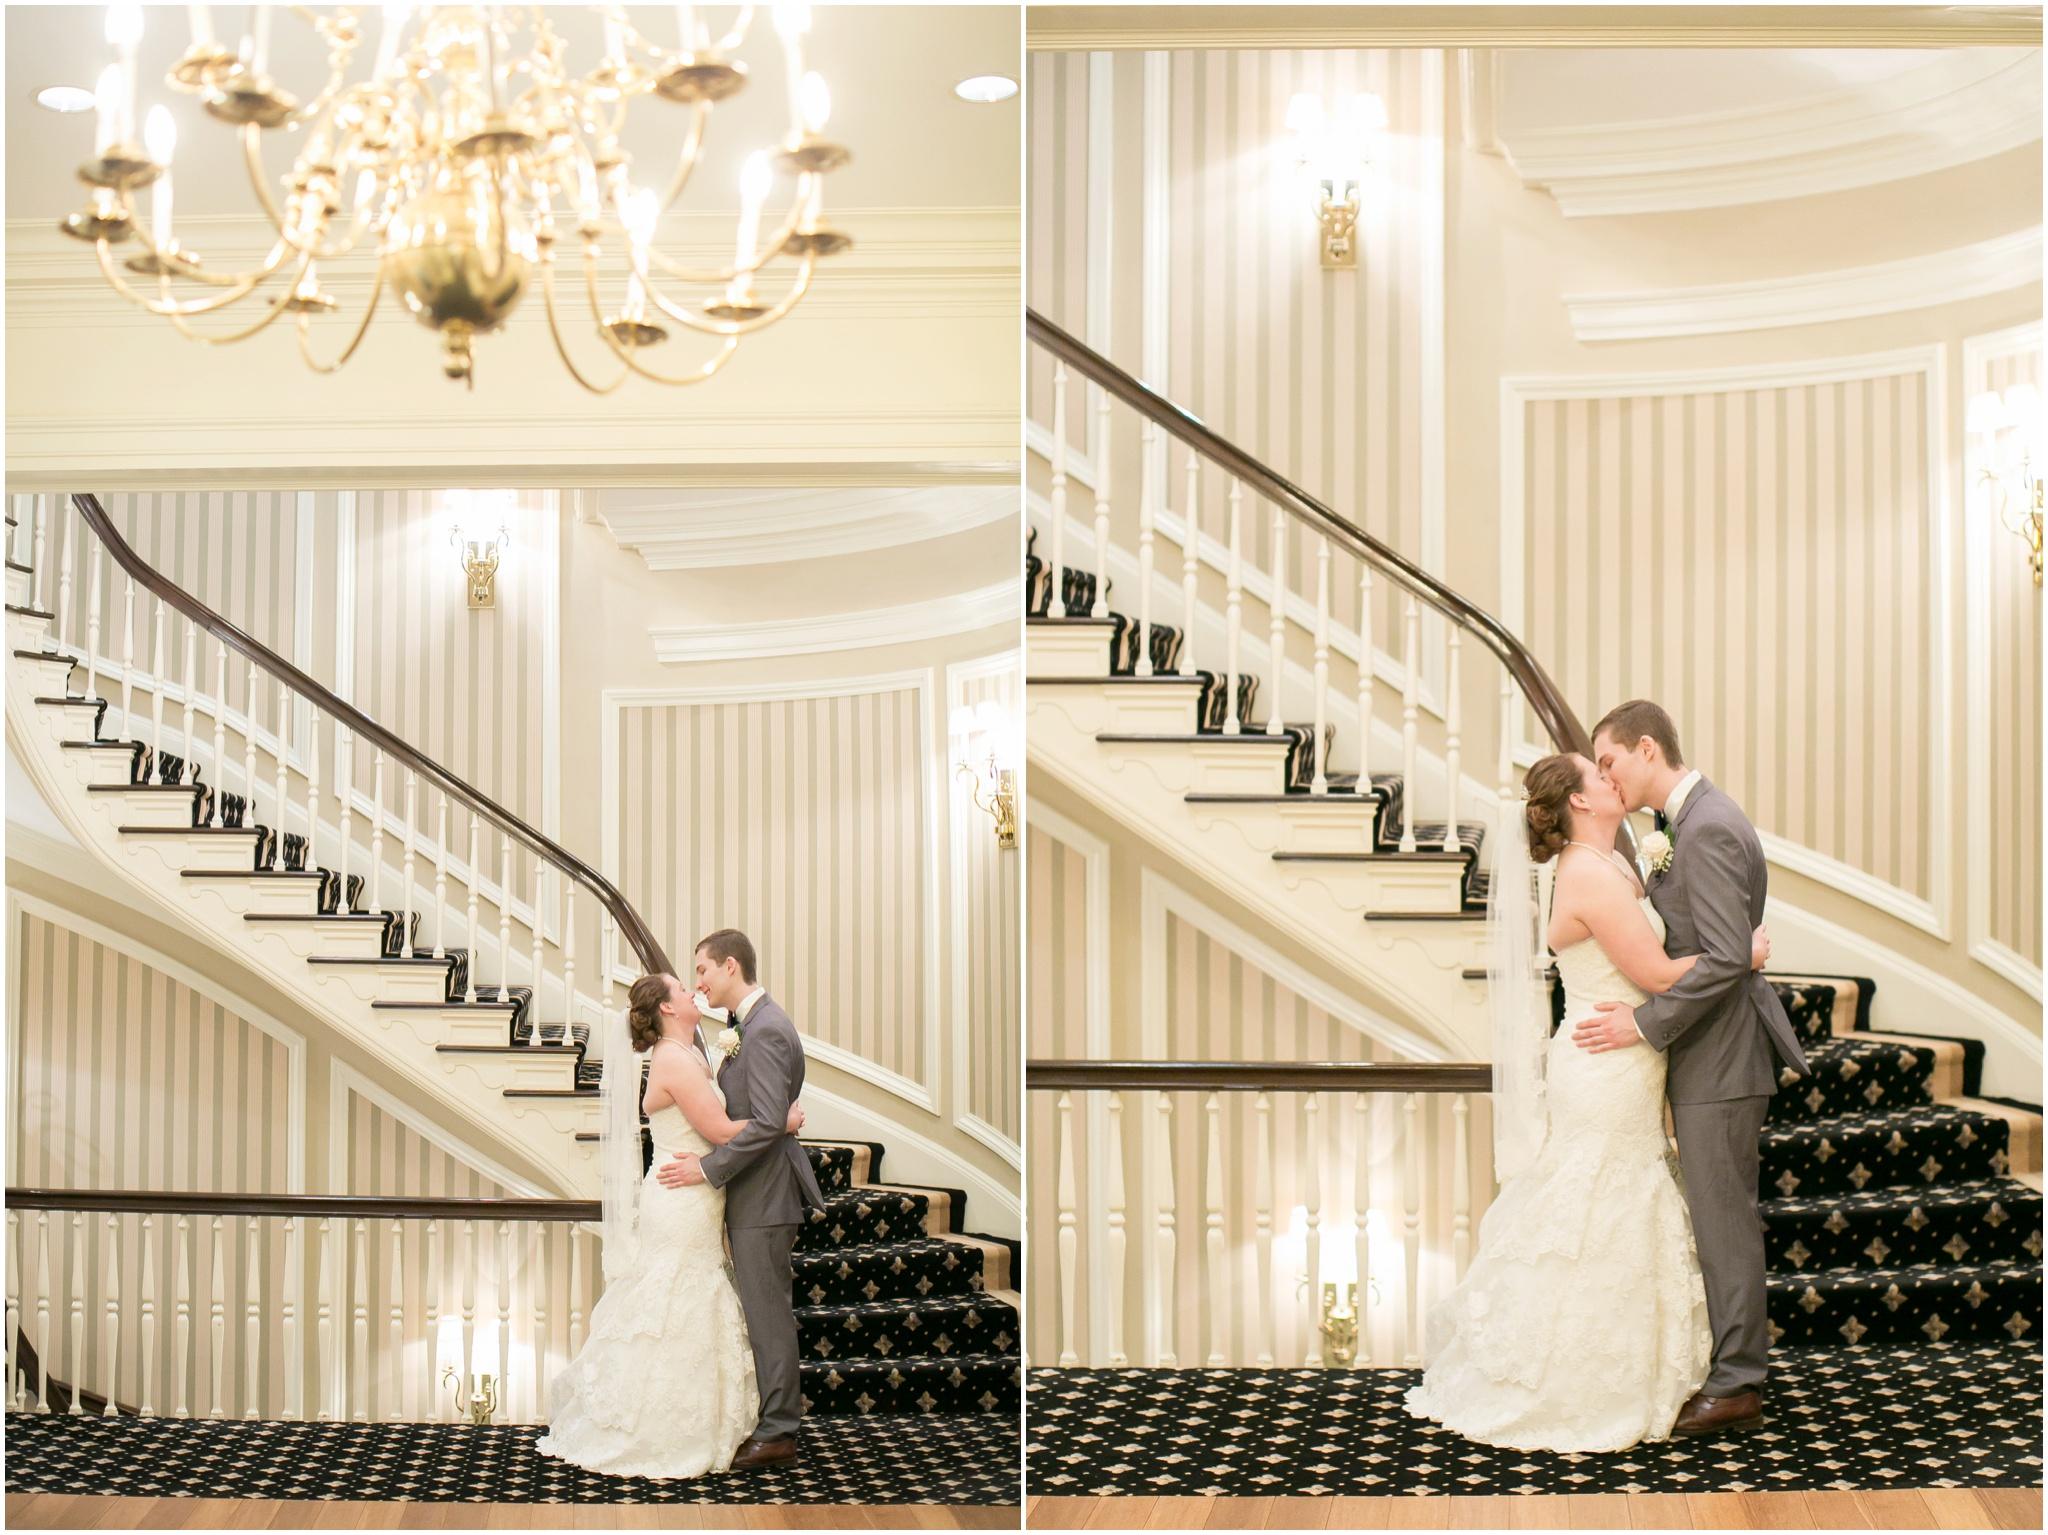 Madison_Club_Madison_Wisconsin_Wedding_Photographer_Spring_Rainy_Wedding_2599.jpg